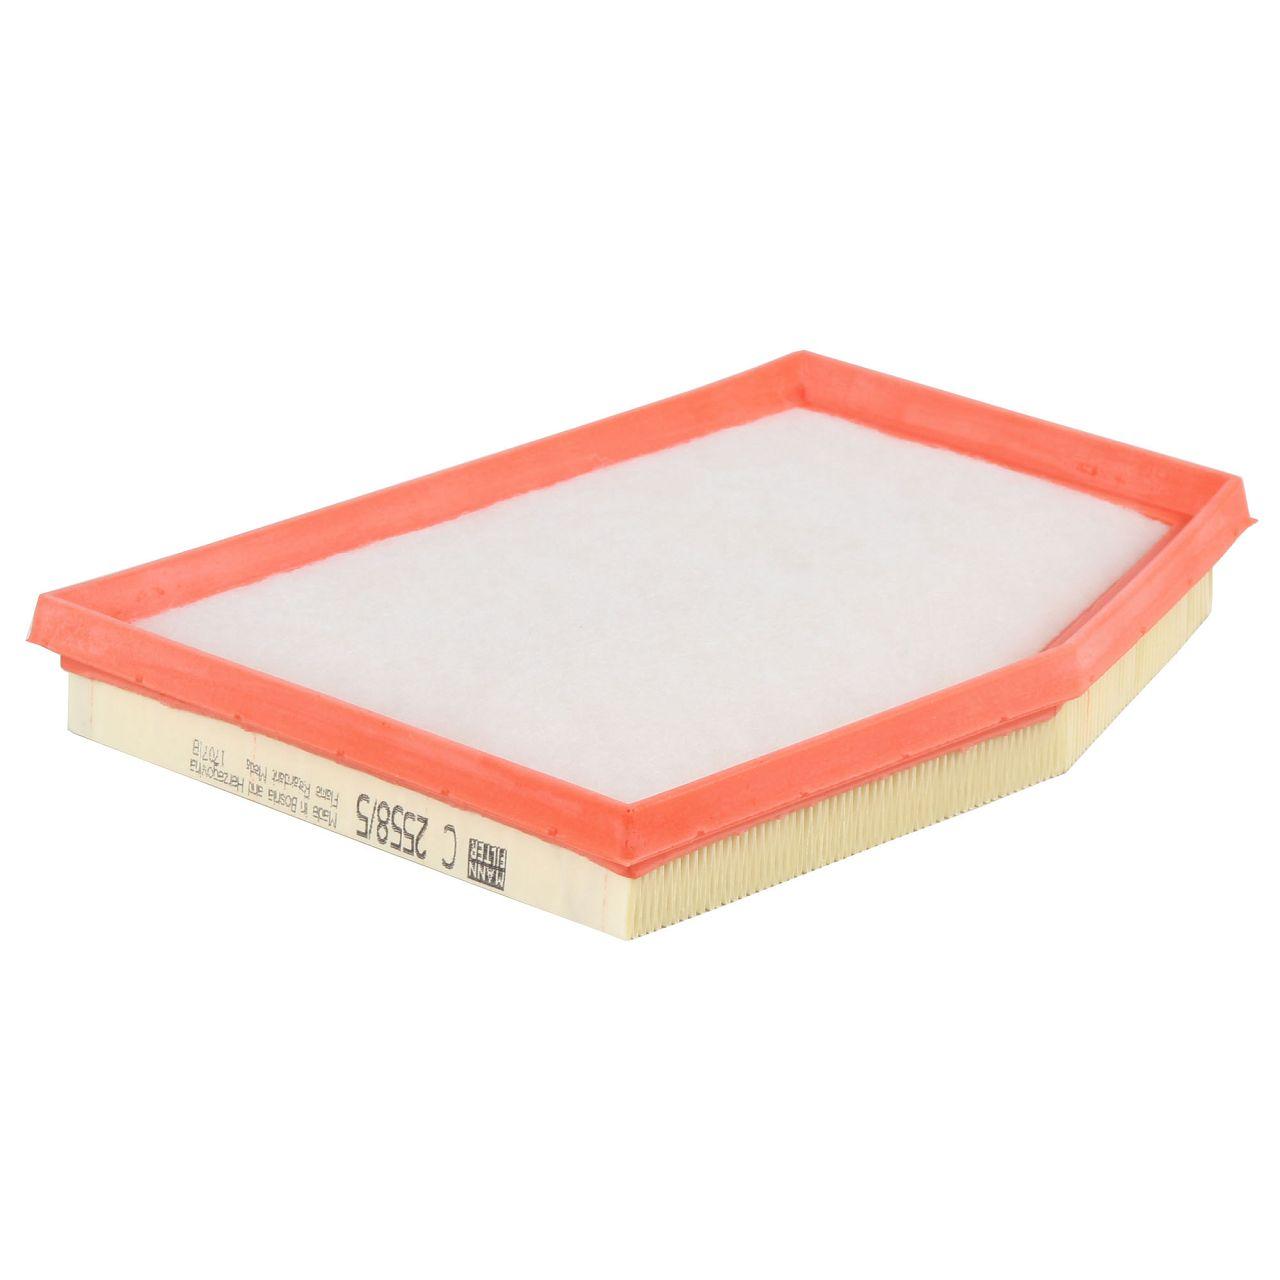 MANN Inspektionskit für PORSCHE BOXSTER (986) 2.5 + 2.7 + S 3.2 204-266 PS